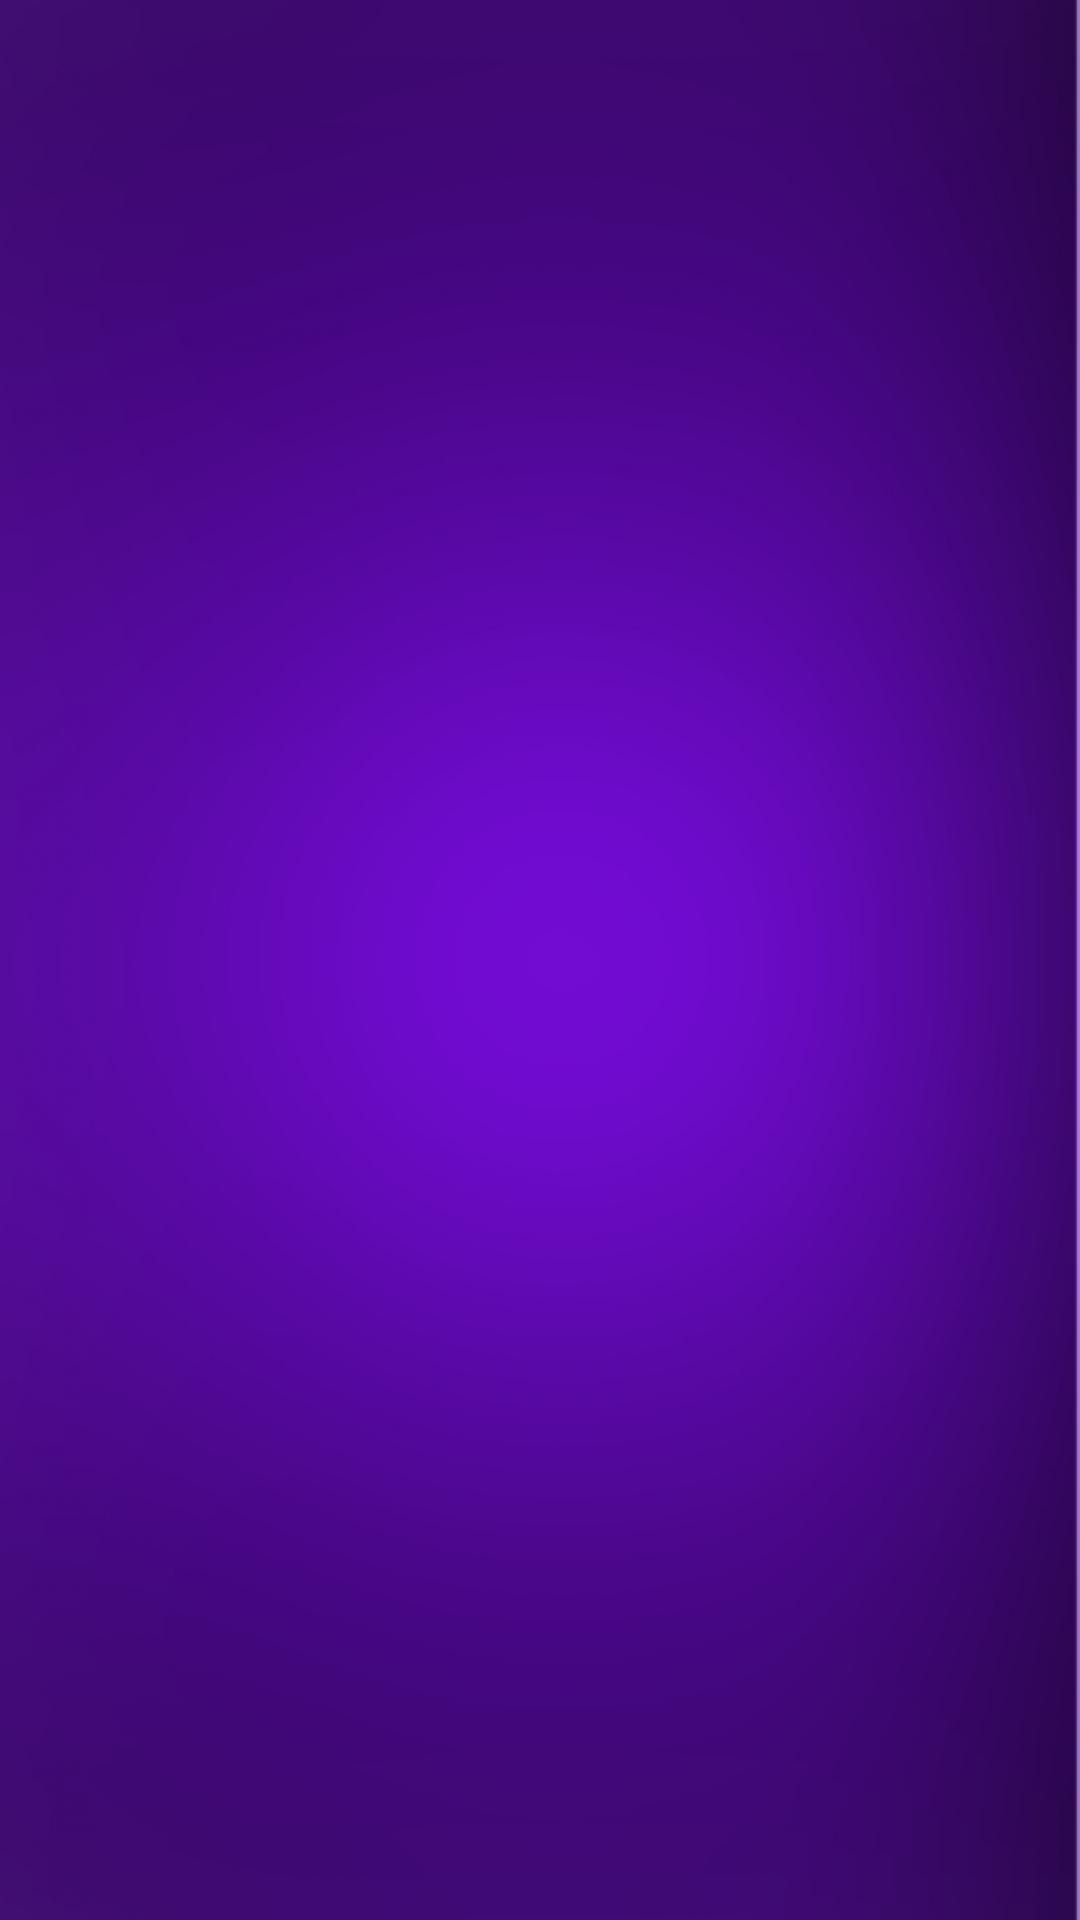 Iphone 6 Retina Wallpaper Iphone Dynamic Wallpaper Purple Ombre